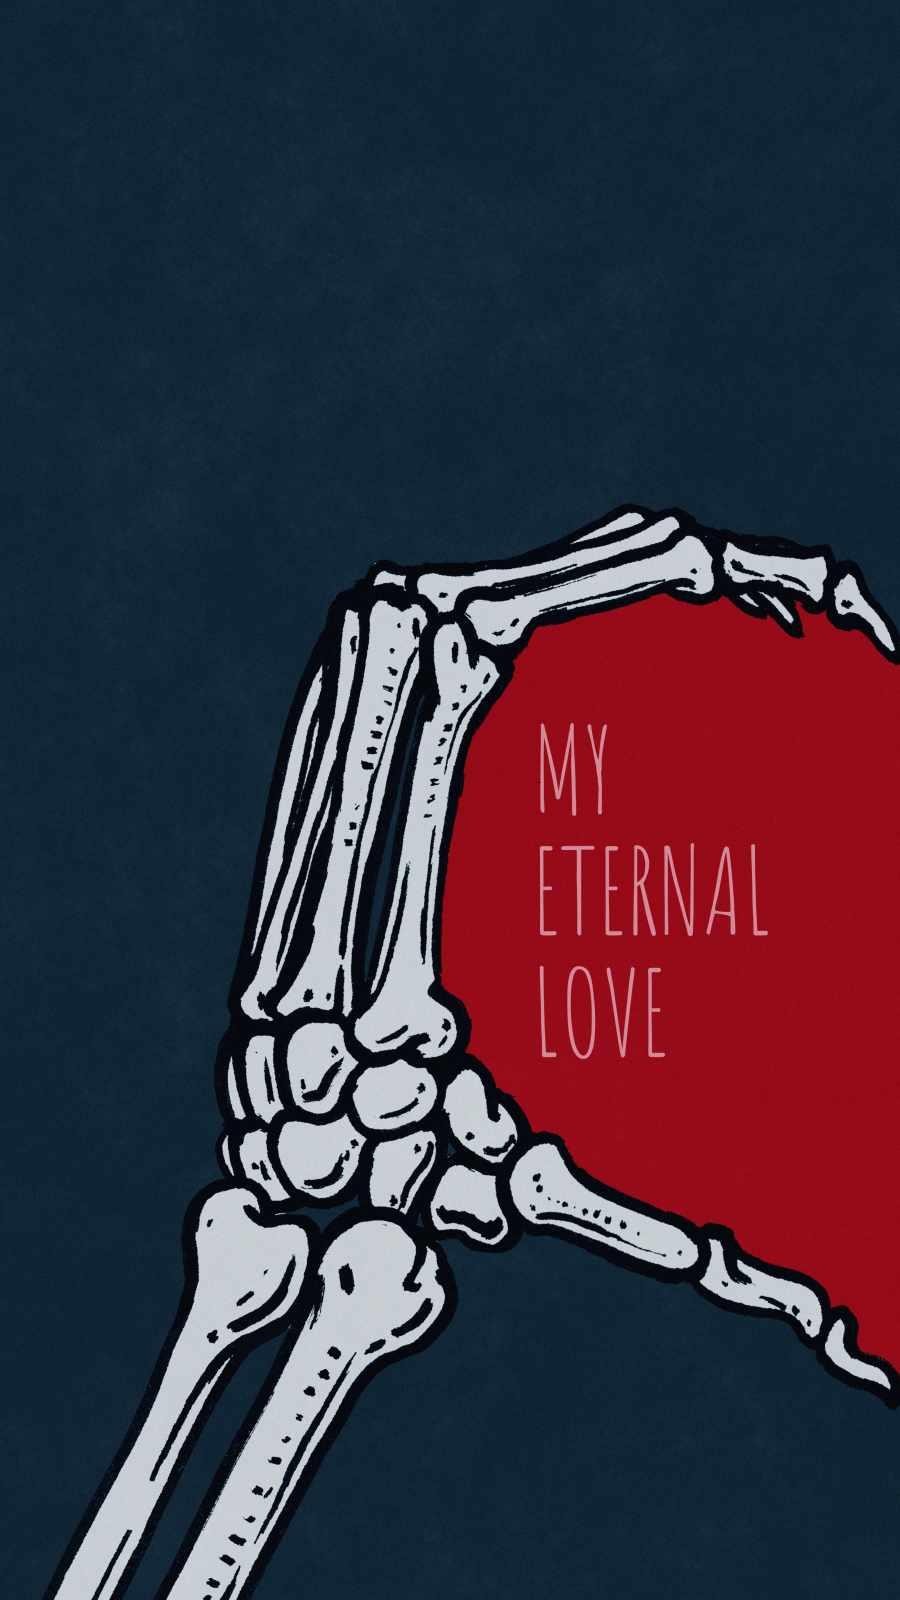 My Eternal Love iPhone Wallpaper